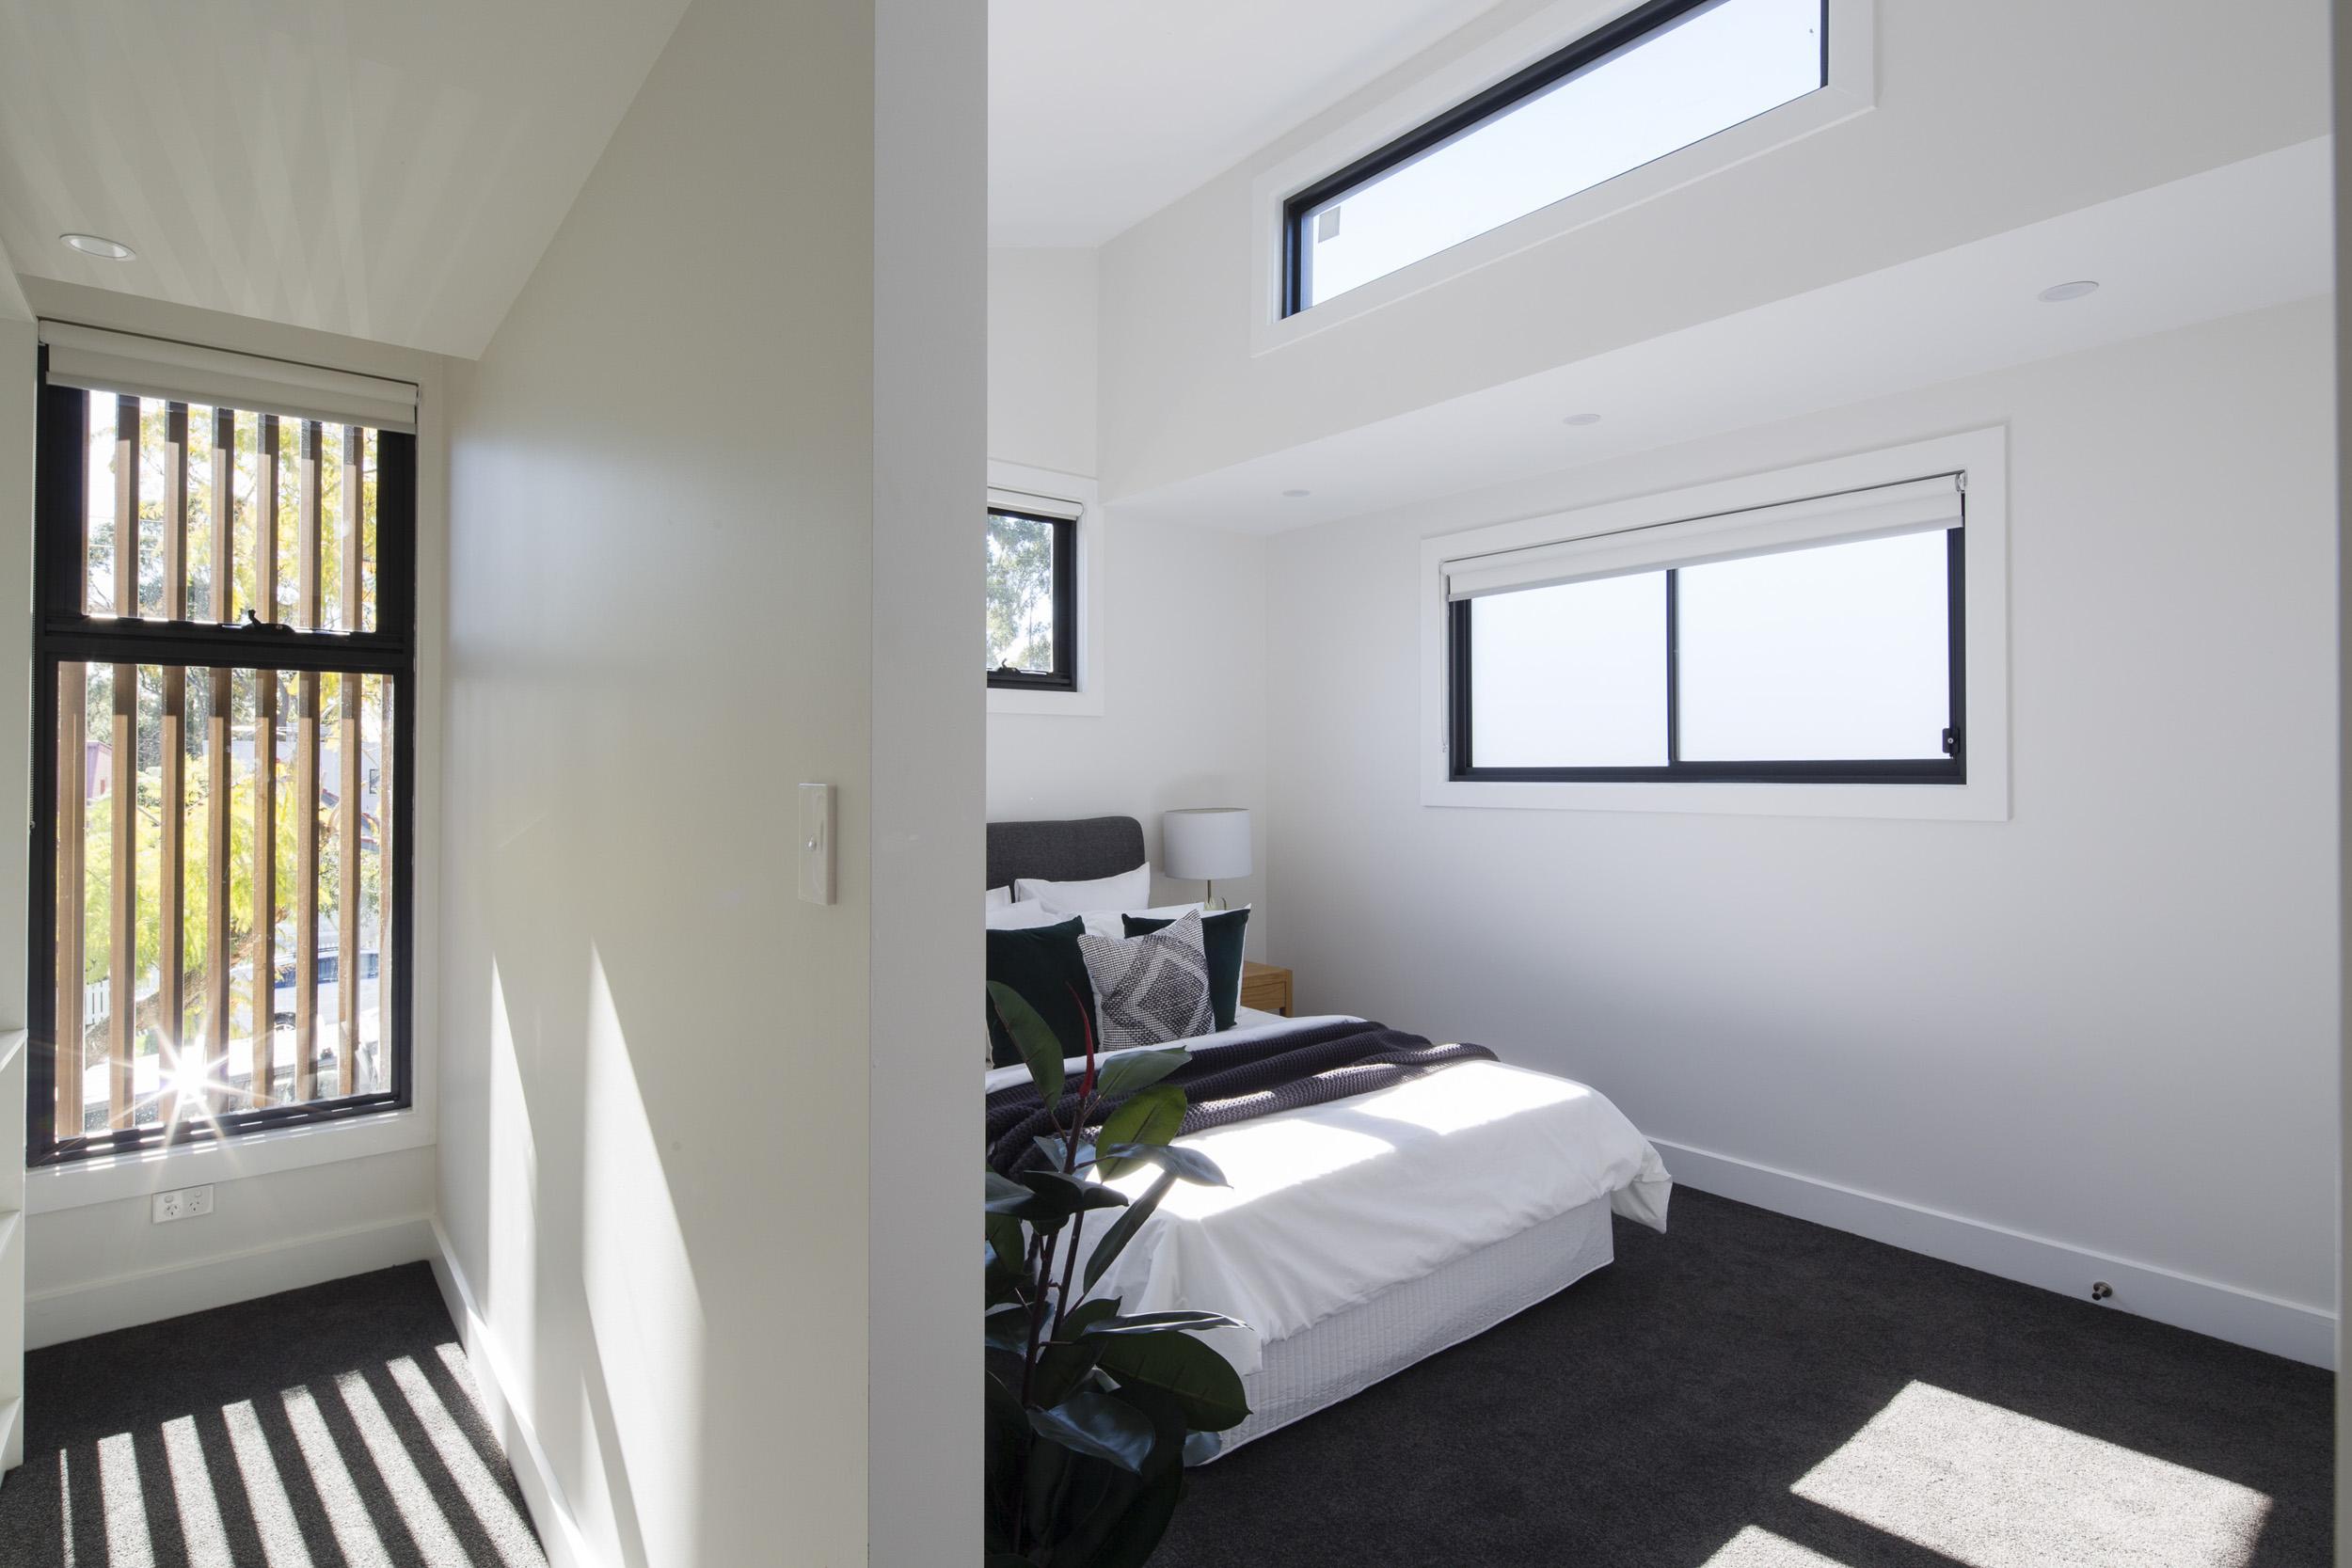 house_photographer_sydney_ns_studio_architects_05.jpg